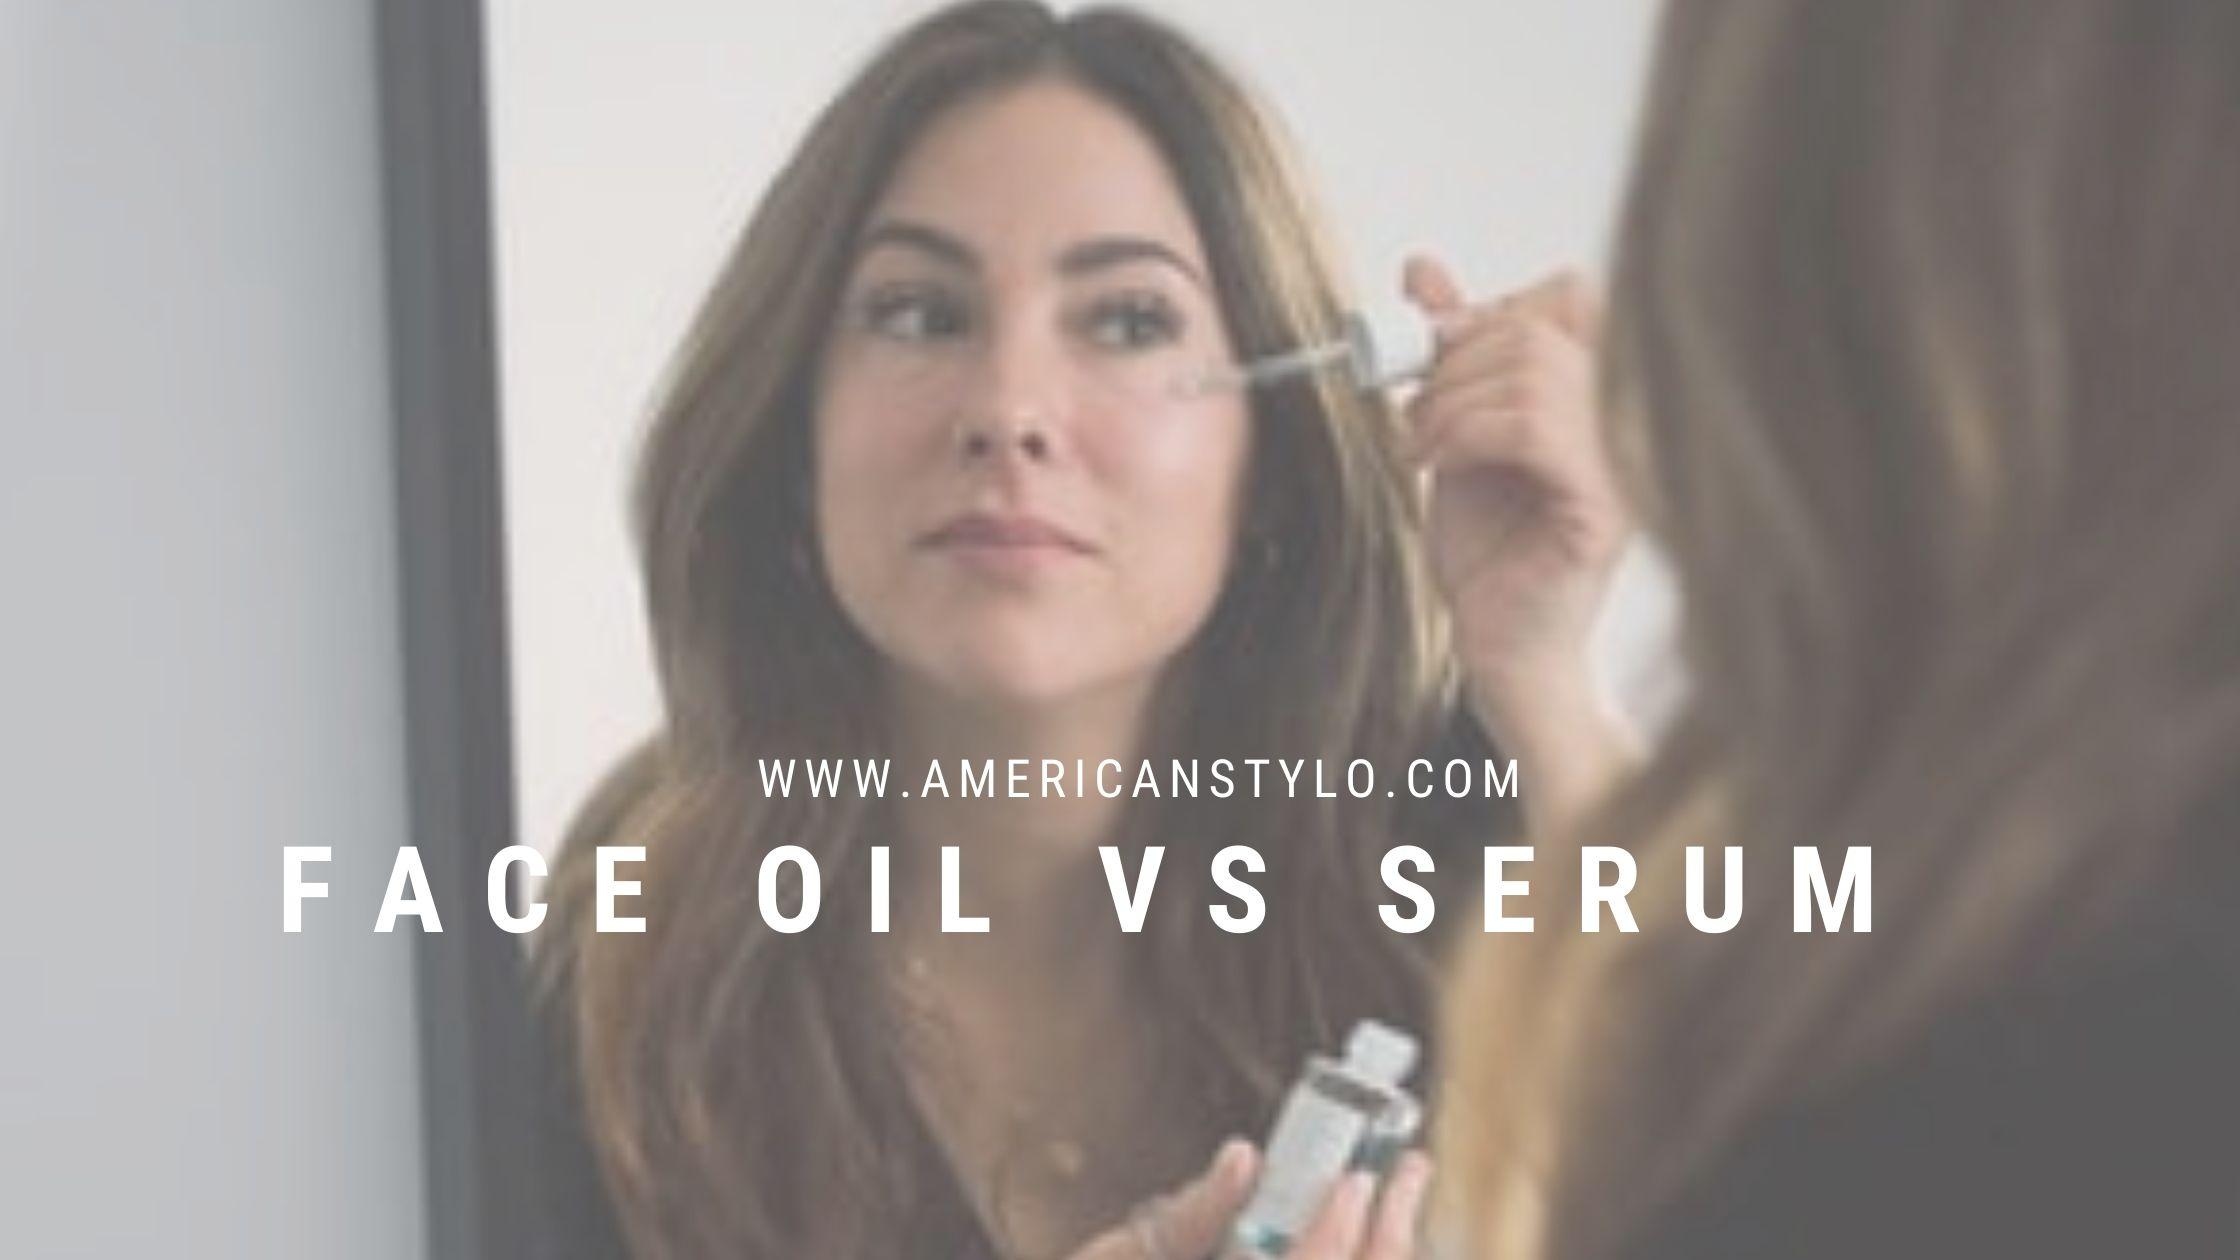 face oil vs serum